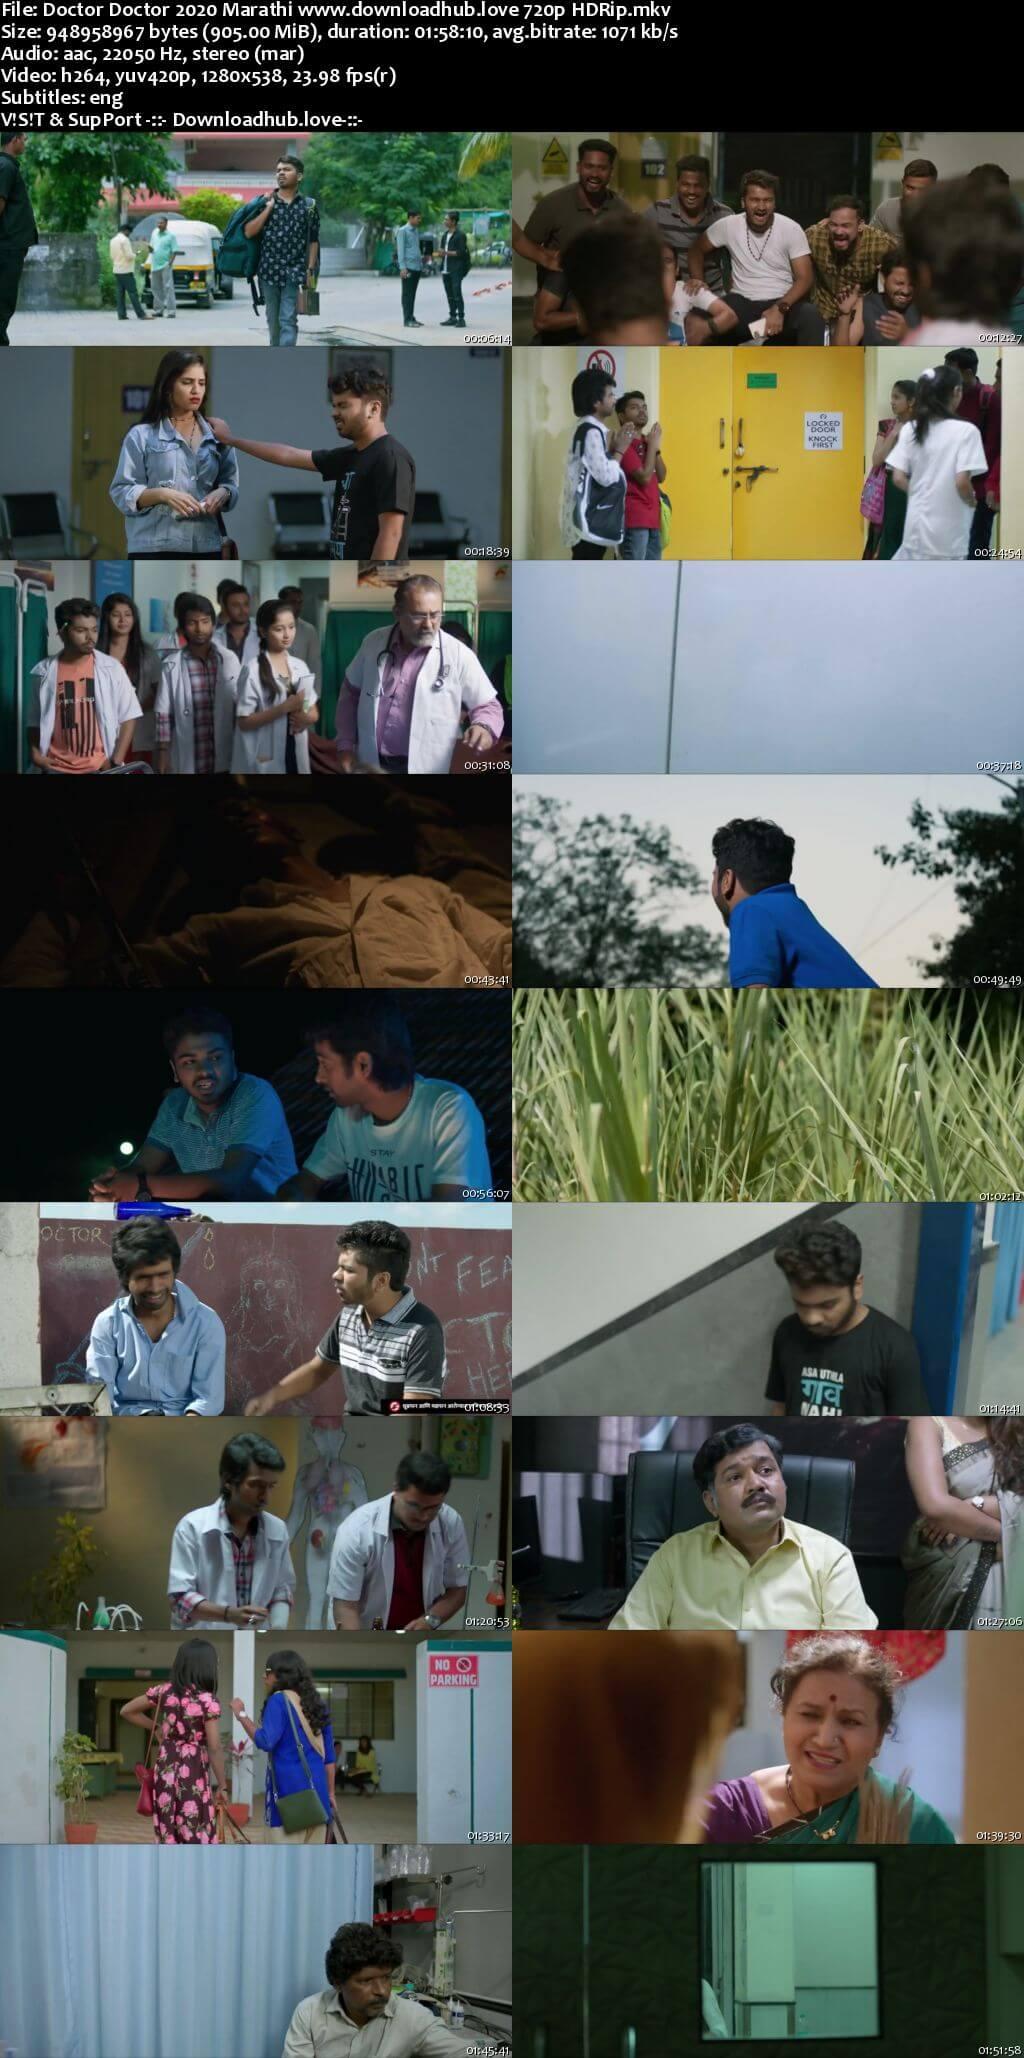 Doctor Doctor 2020 Marathi 720p HDRip ESubs